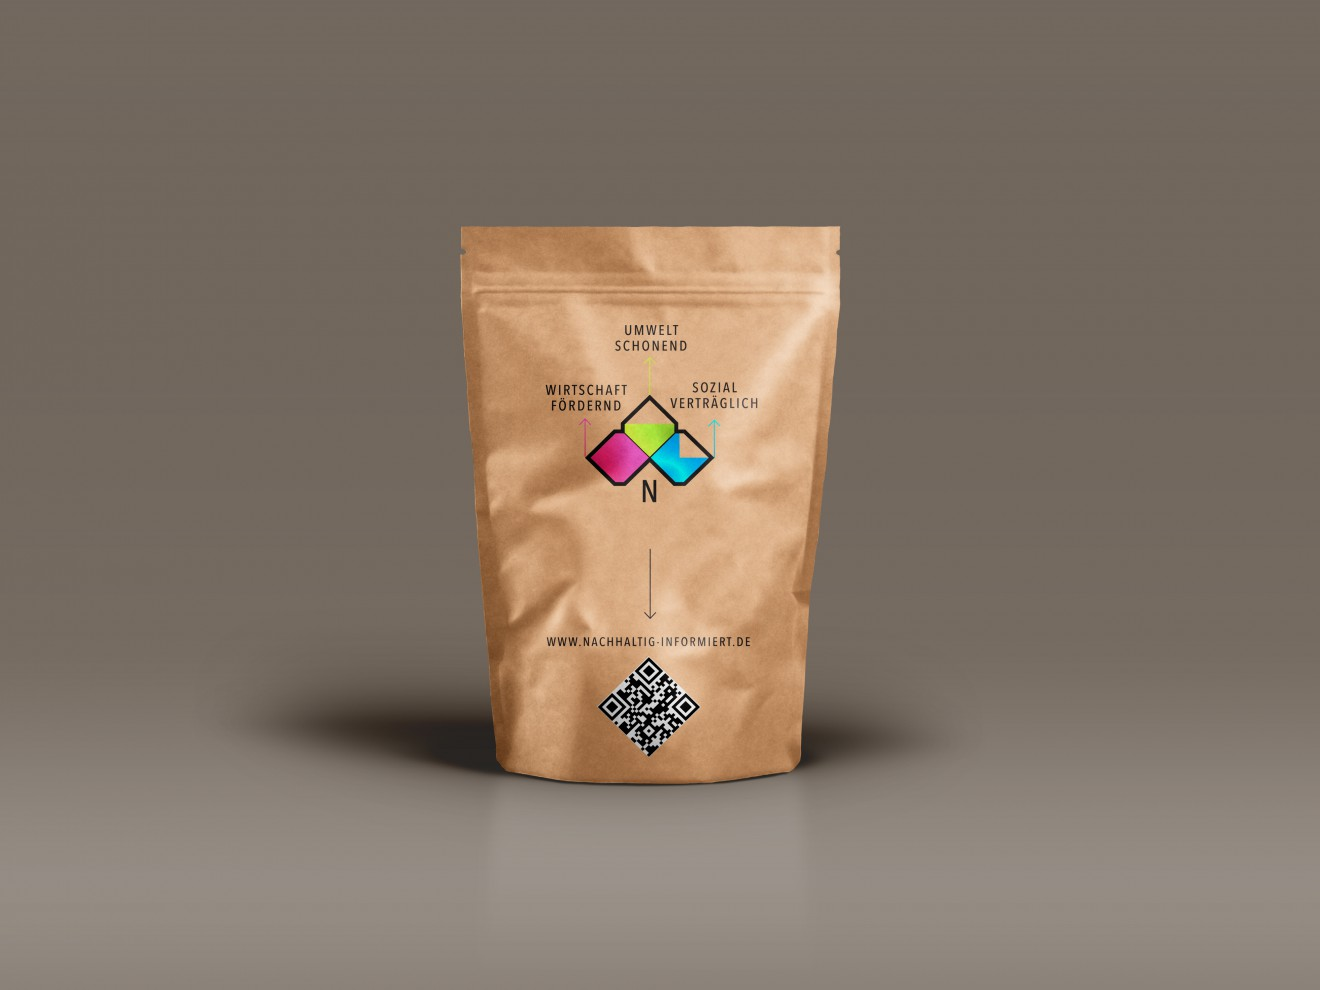 Nachhaltig_Paper-Bag-packaging